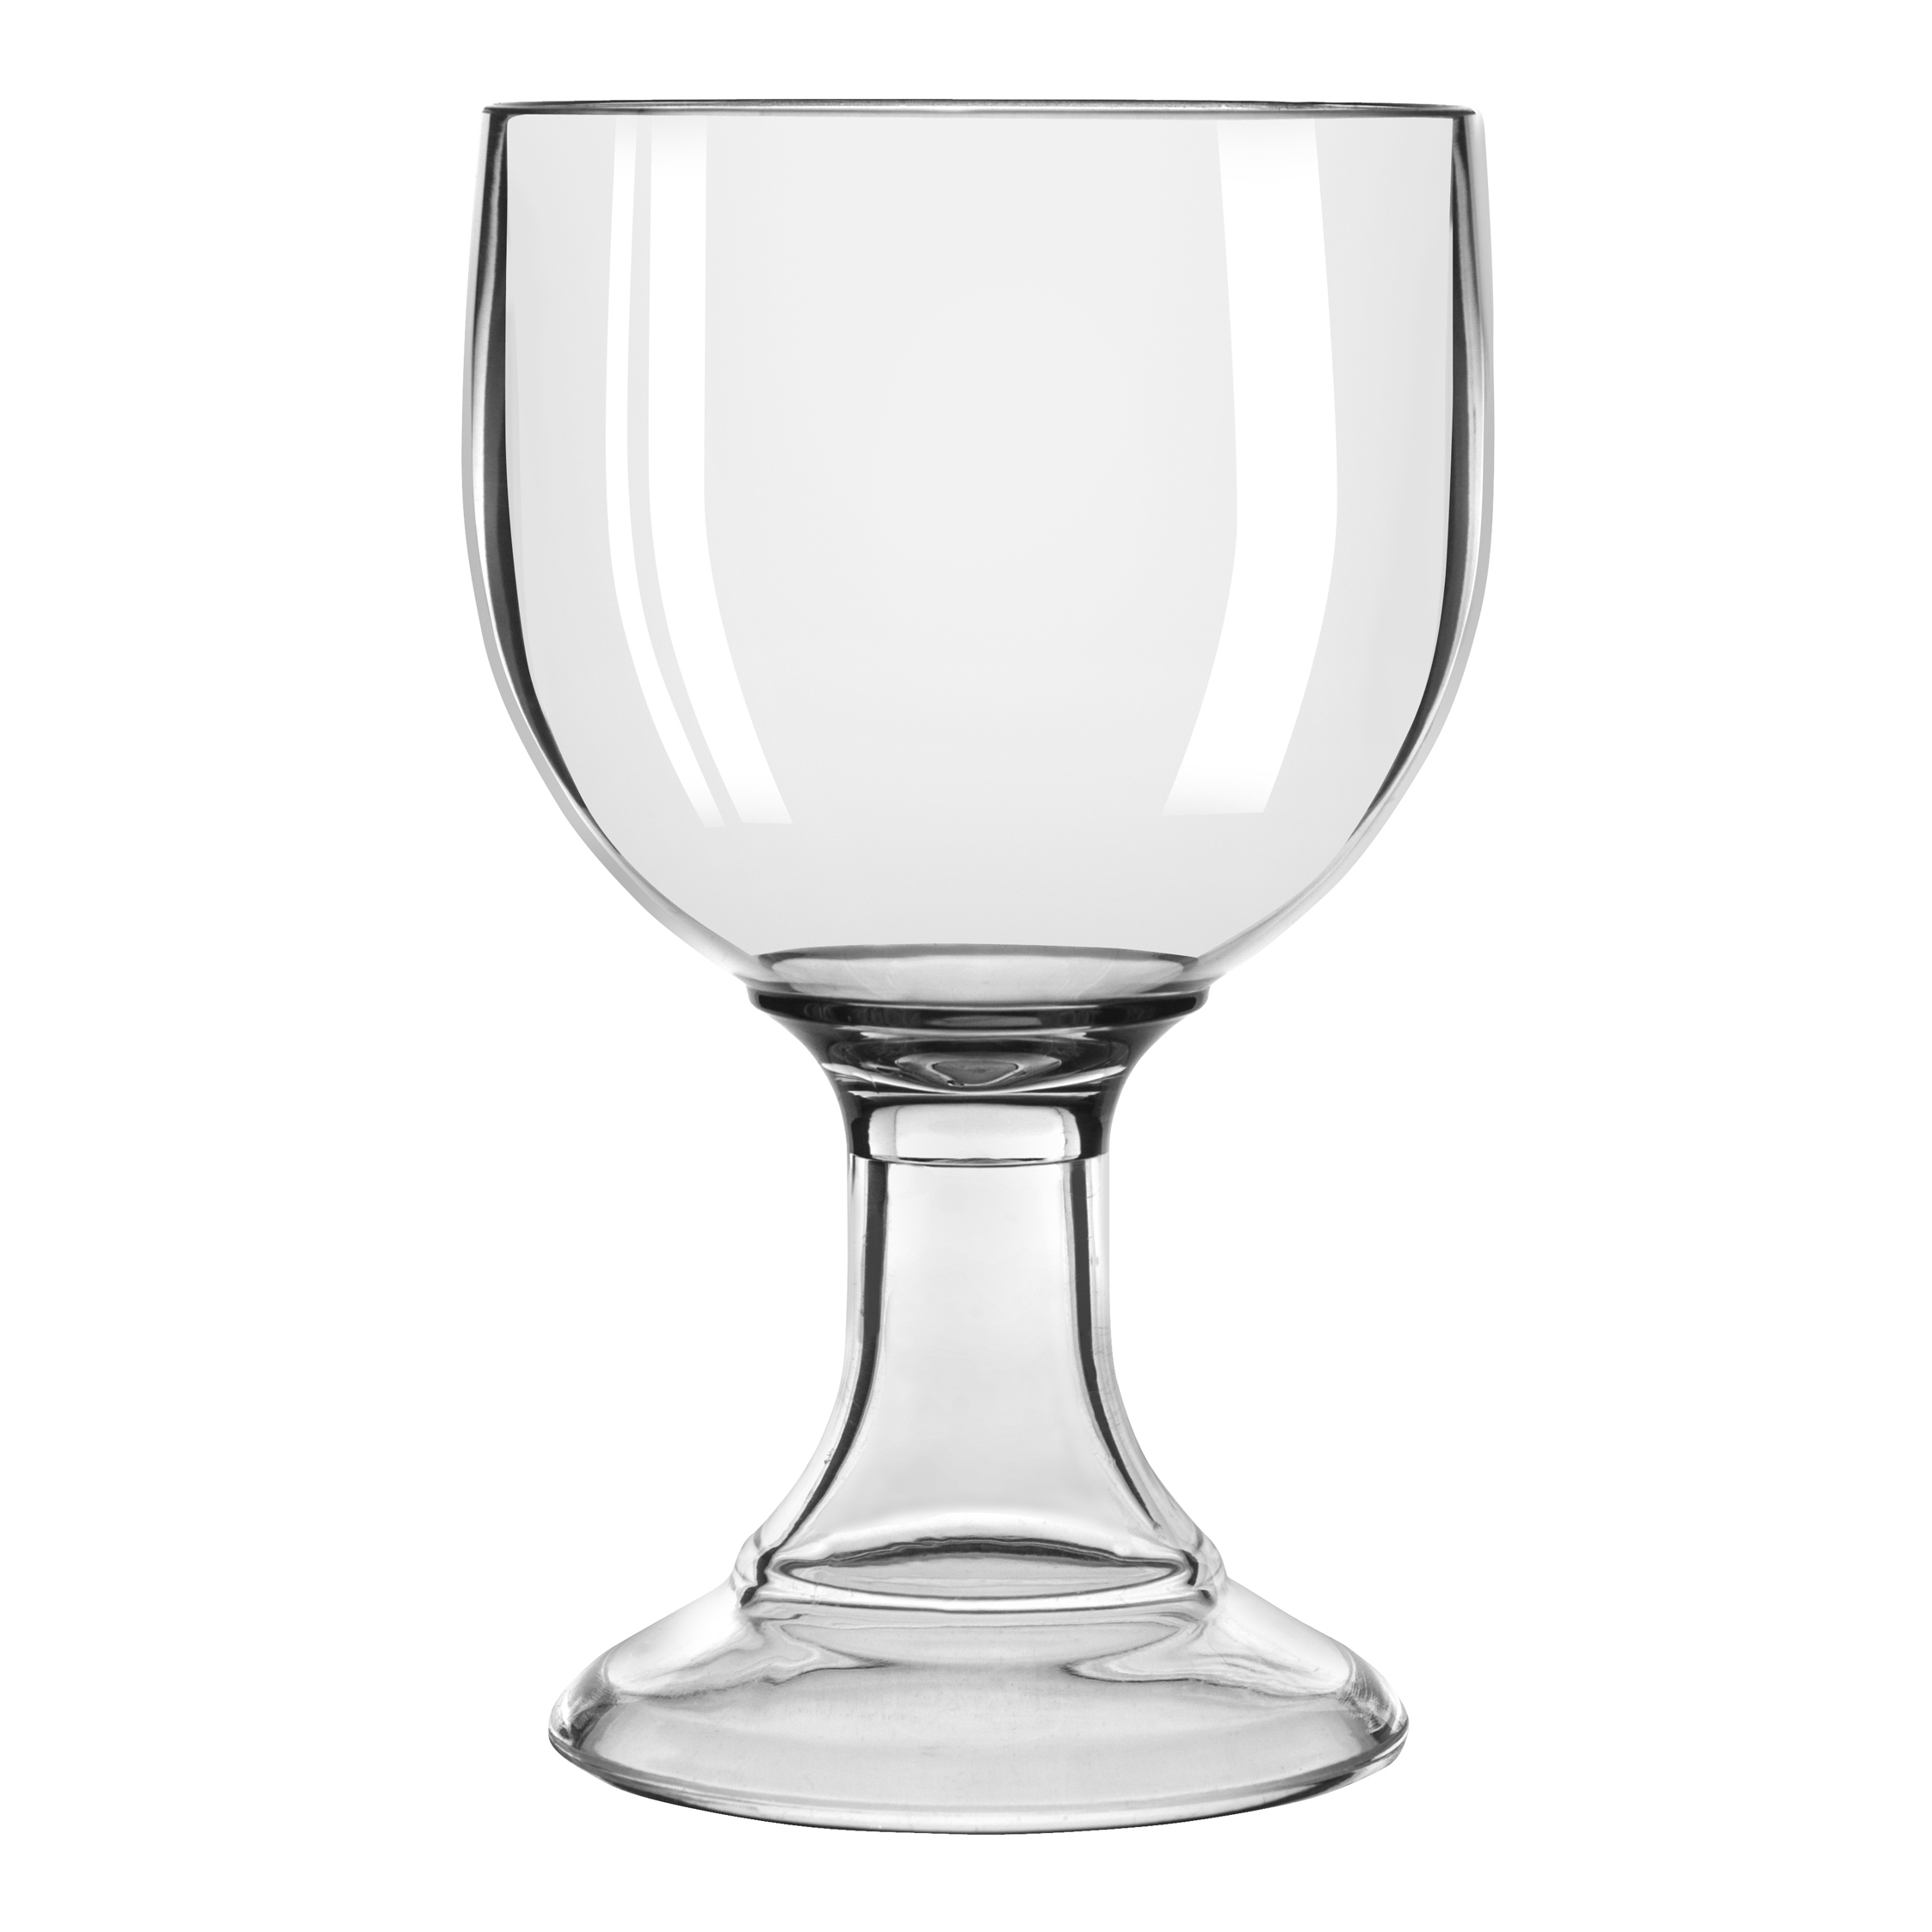 Libbey Glass 92422 glassware, plastic